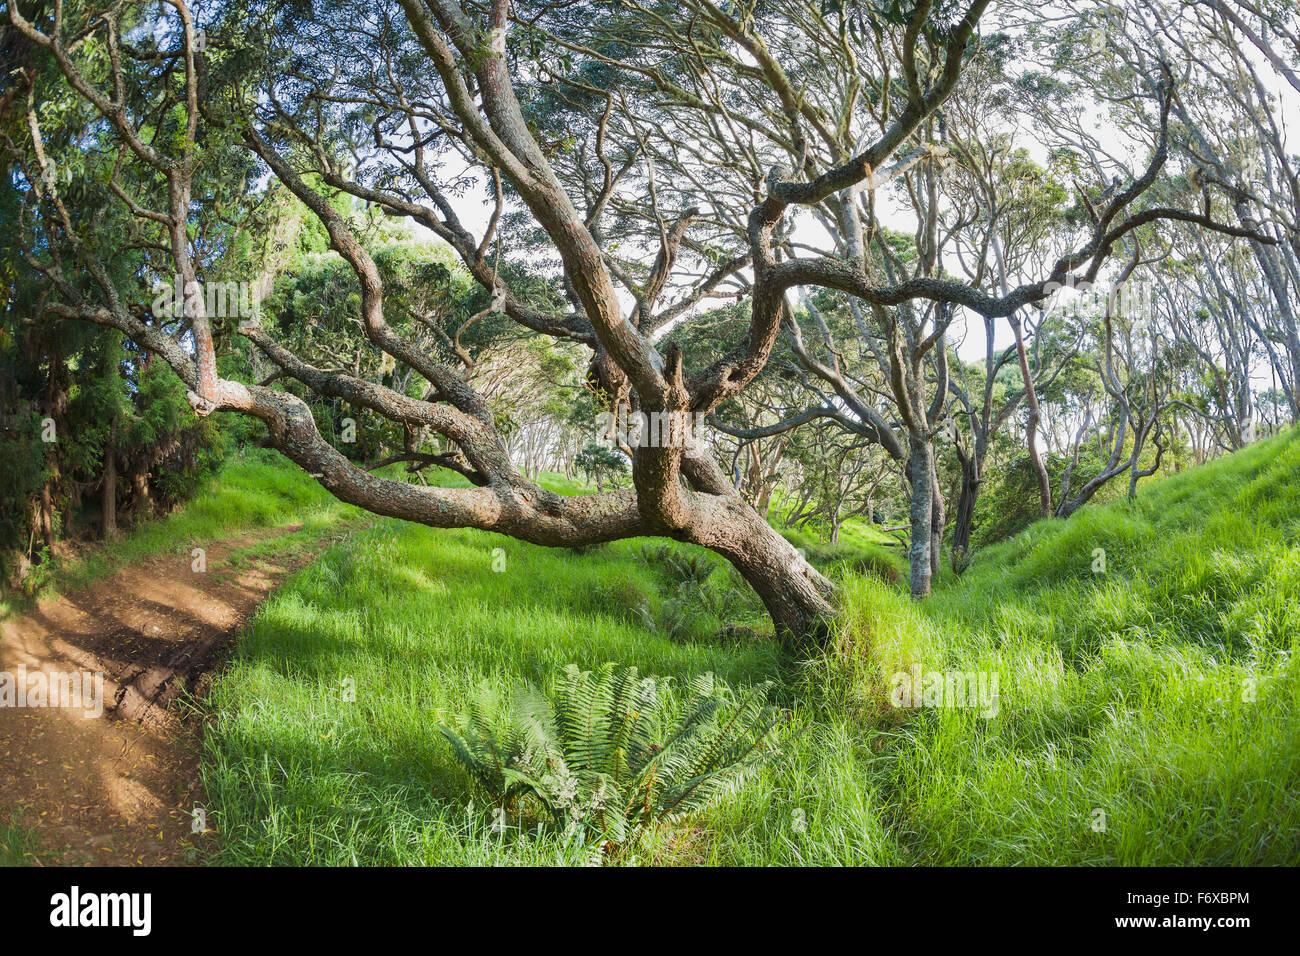 Koa Trees Koa Acacia In Keanakolu State Park Along Mana